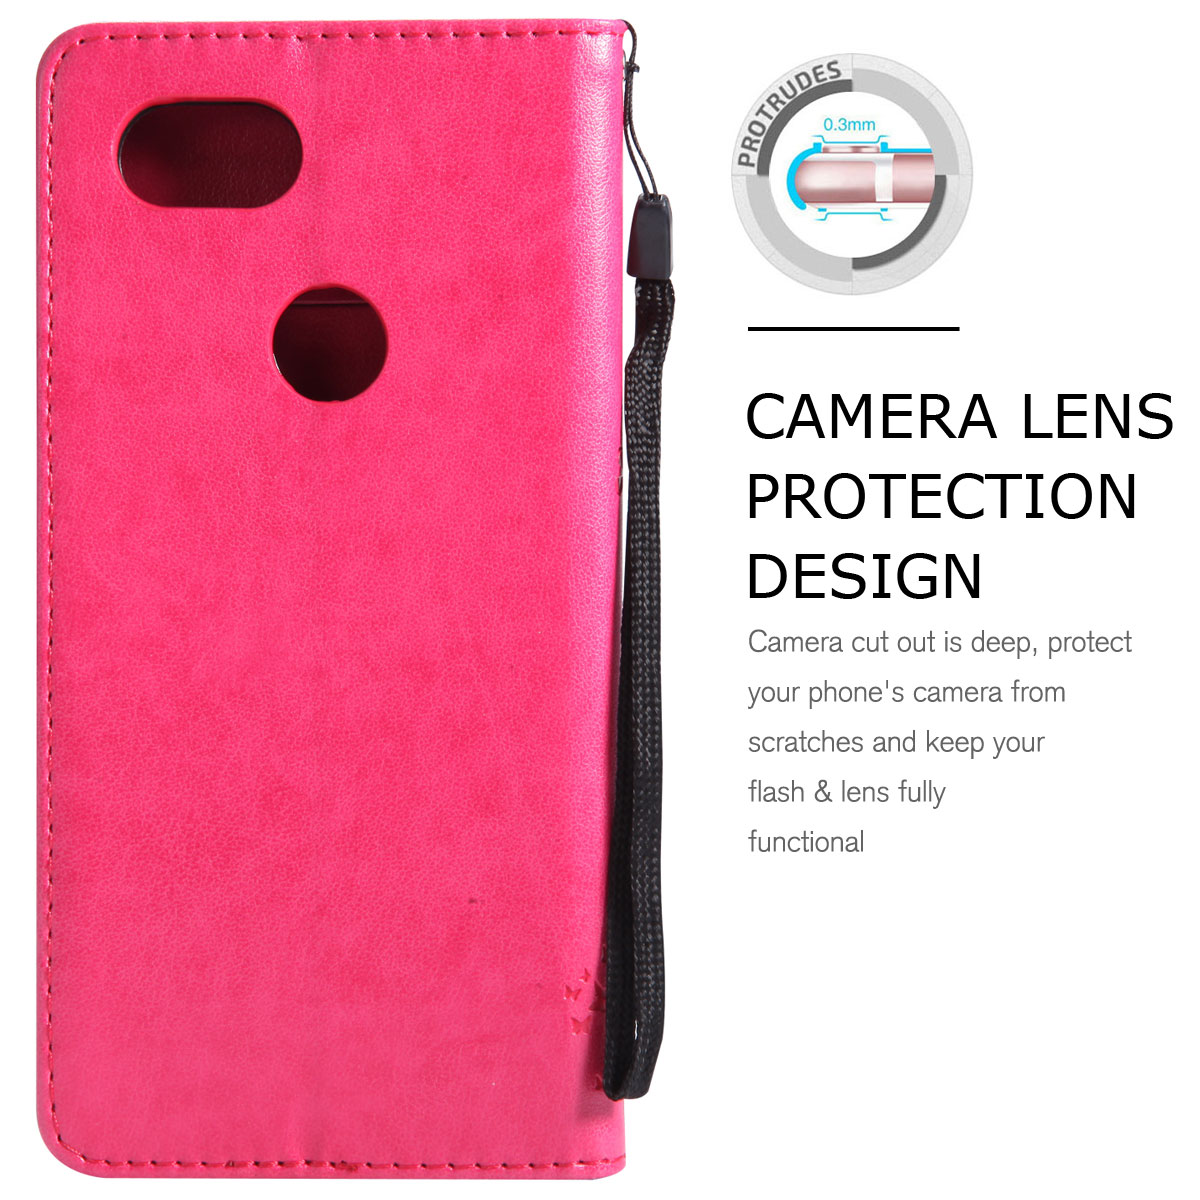 Magnetic-Leather-Credit-Card-Holder-Flip-Case-Cover-For-Google-Pixel-2-2-XL thumbnail 42